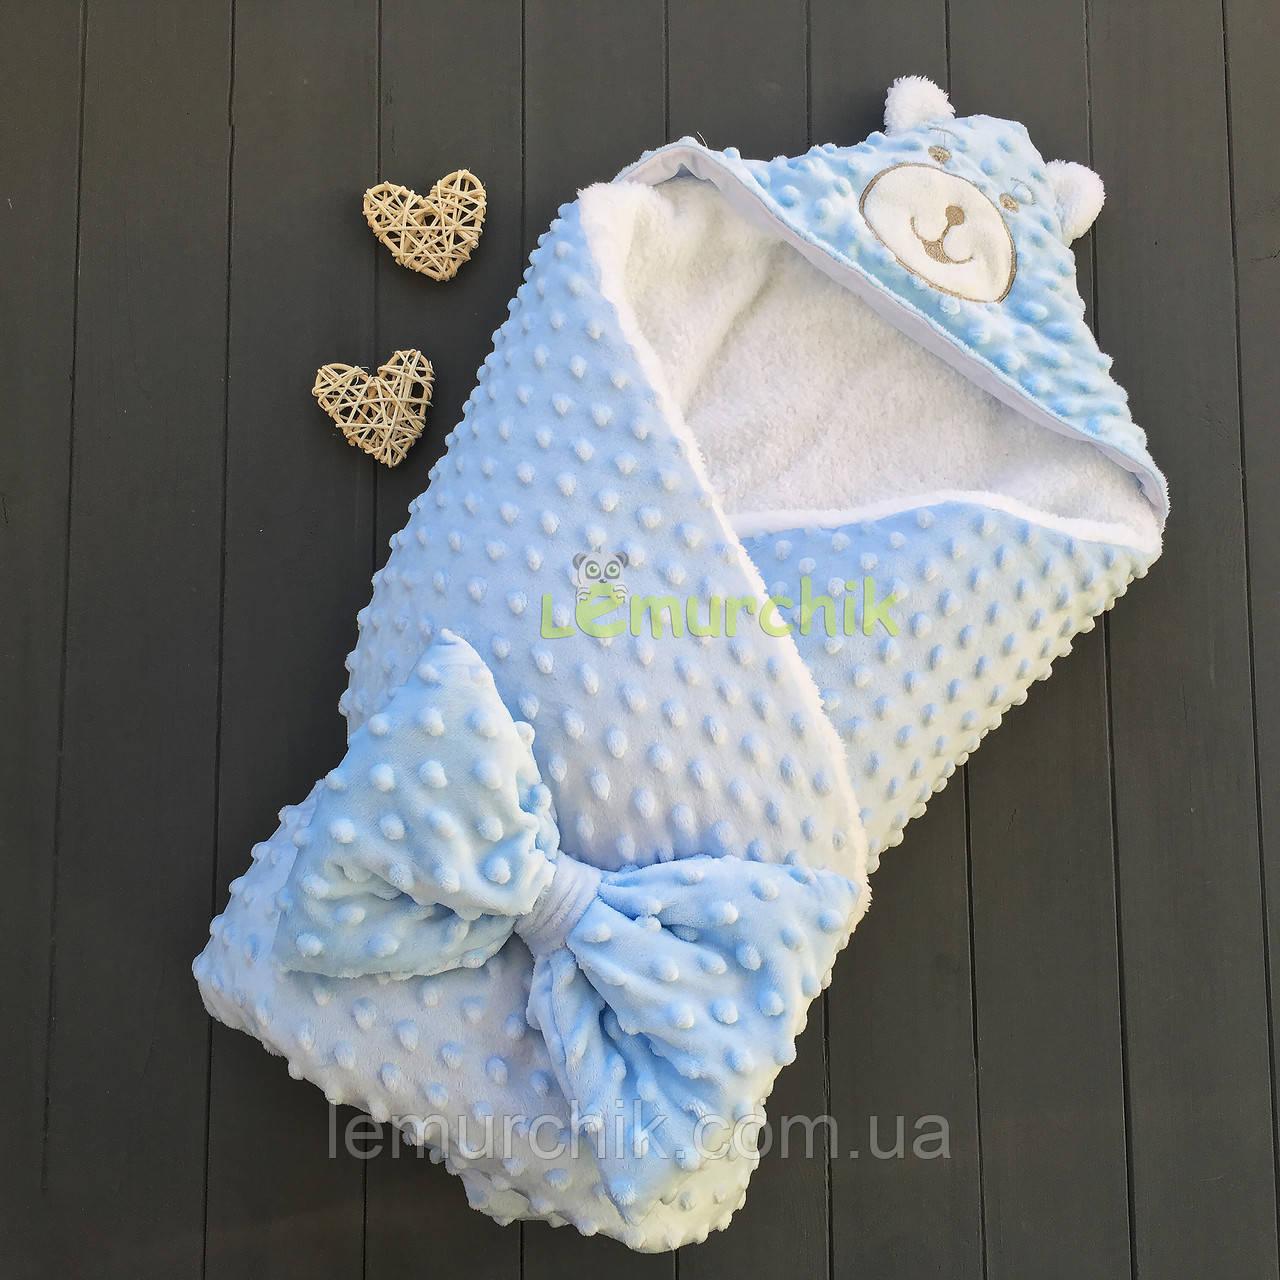 Конверт-одеяло минки на махре с ушками, голубой